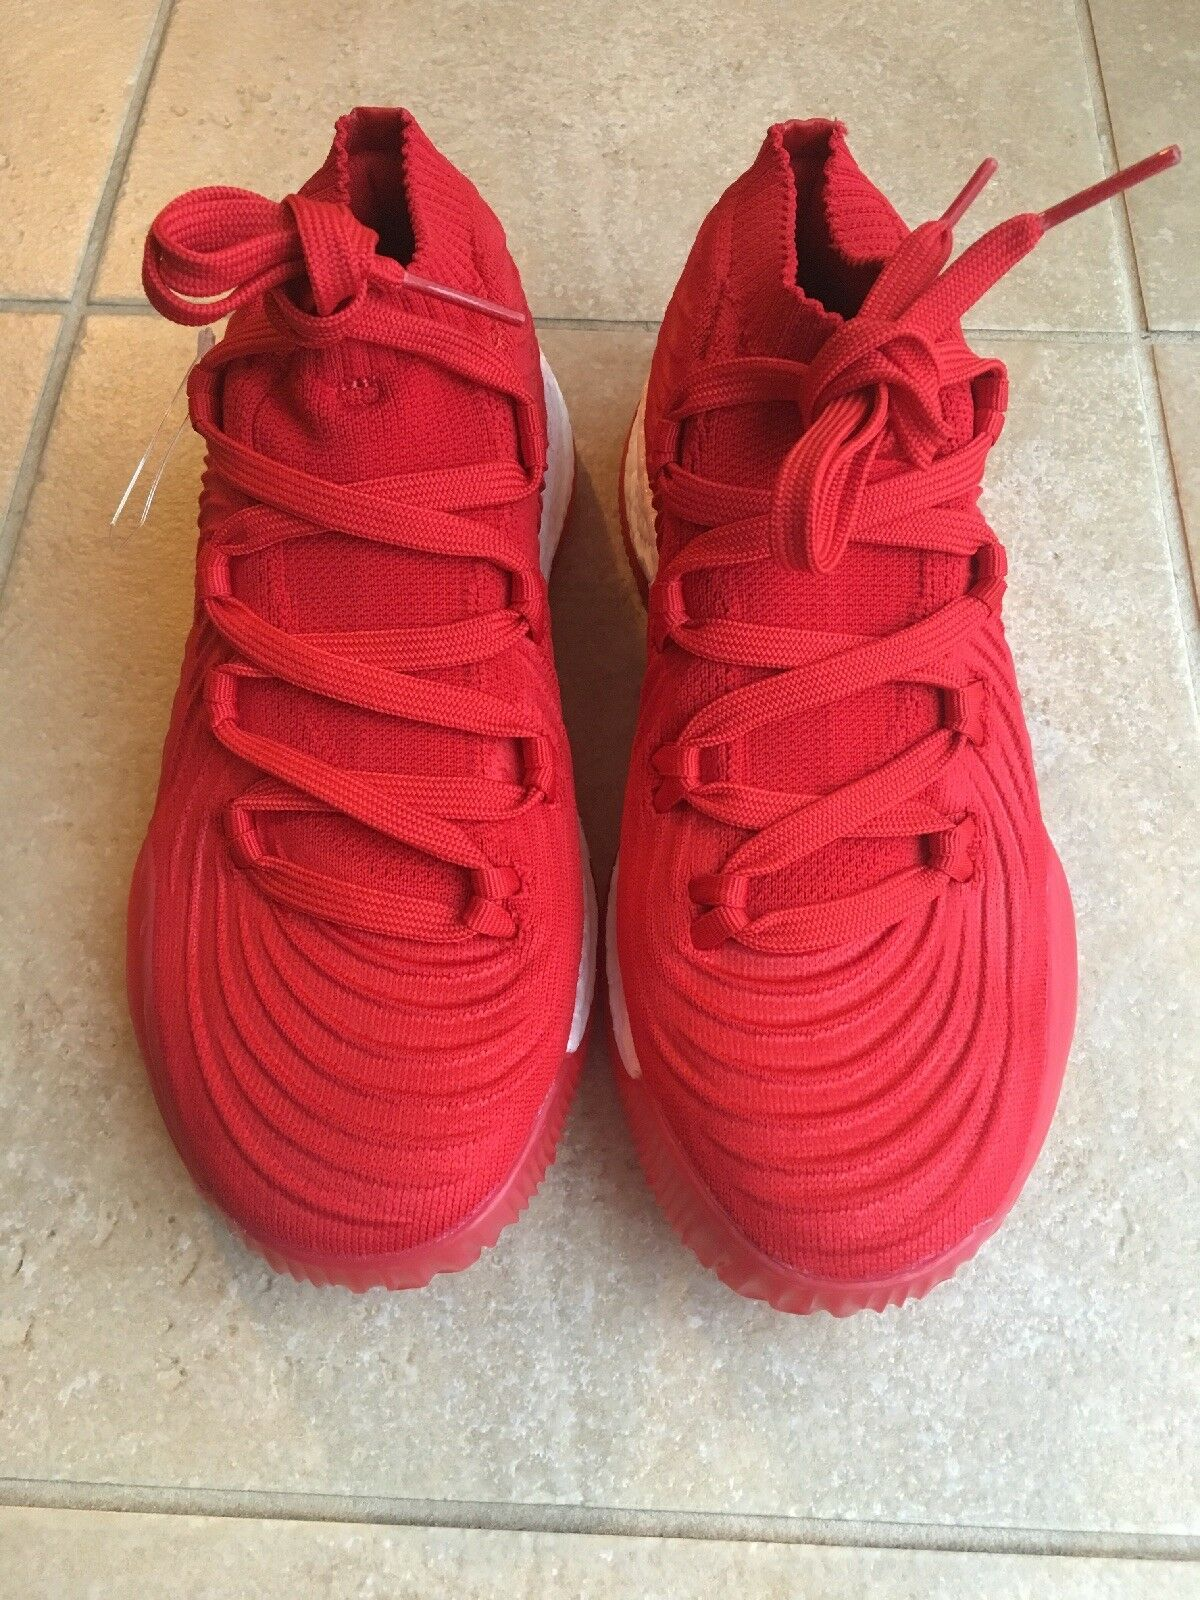 pretty nice 44306 b3bbf ... ULTRA BOOST TURBO RED CORE BLACK 1.0 2.0 BB1237,Adidas Men s Originals  EQT Cushion ADV shoes,  Adidas SM Crazy Crazy Crazy Explosive 2017  Primeknit PK ...